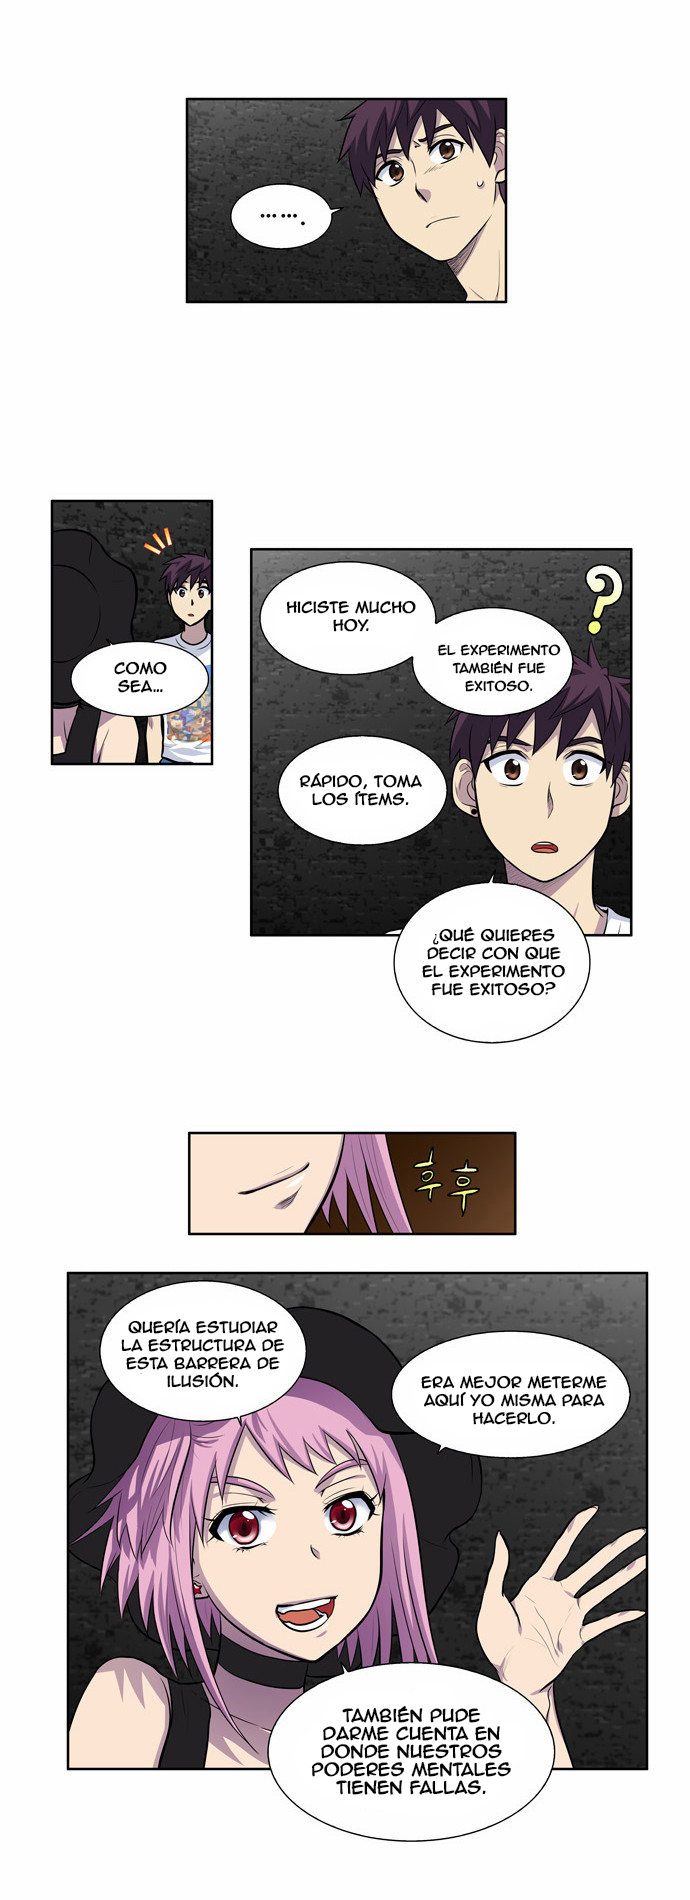 https://c5.ninemanga.com/es_manga/61/1725/416523/0609154fa35b3194026346c9cac2a248.jpg Page 7